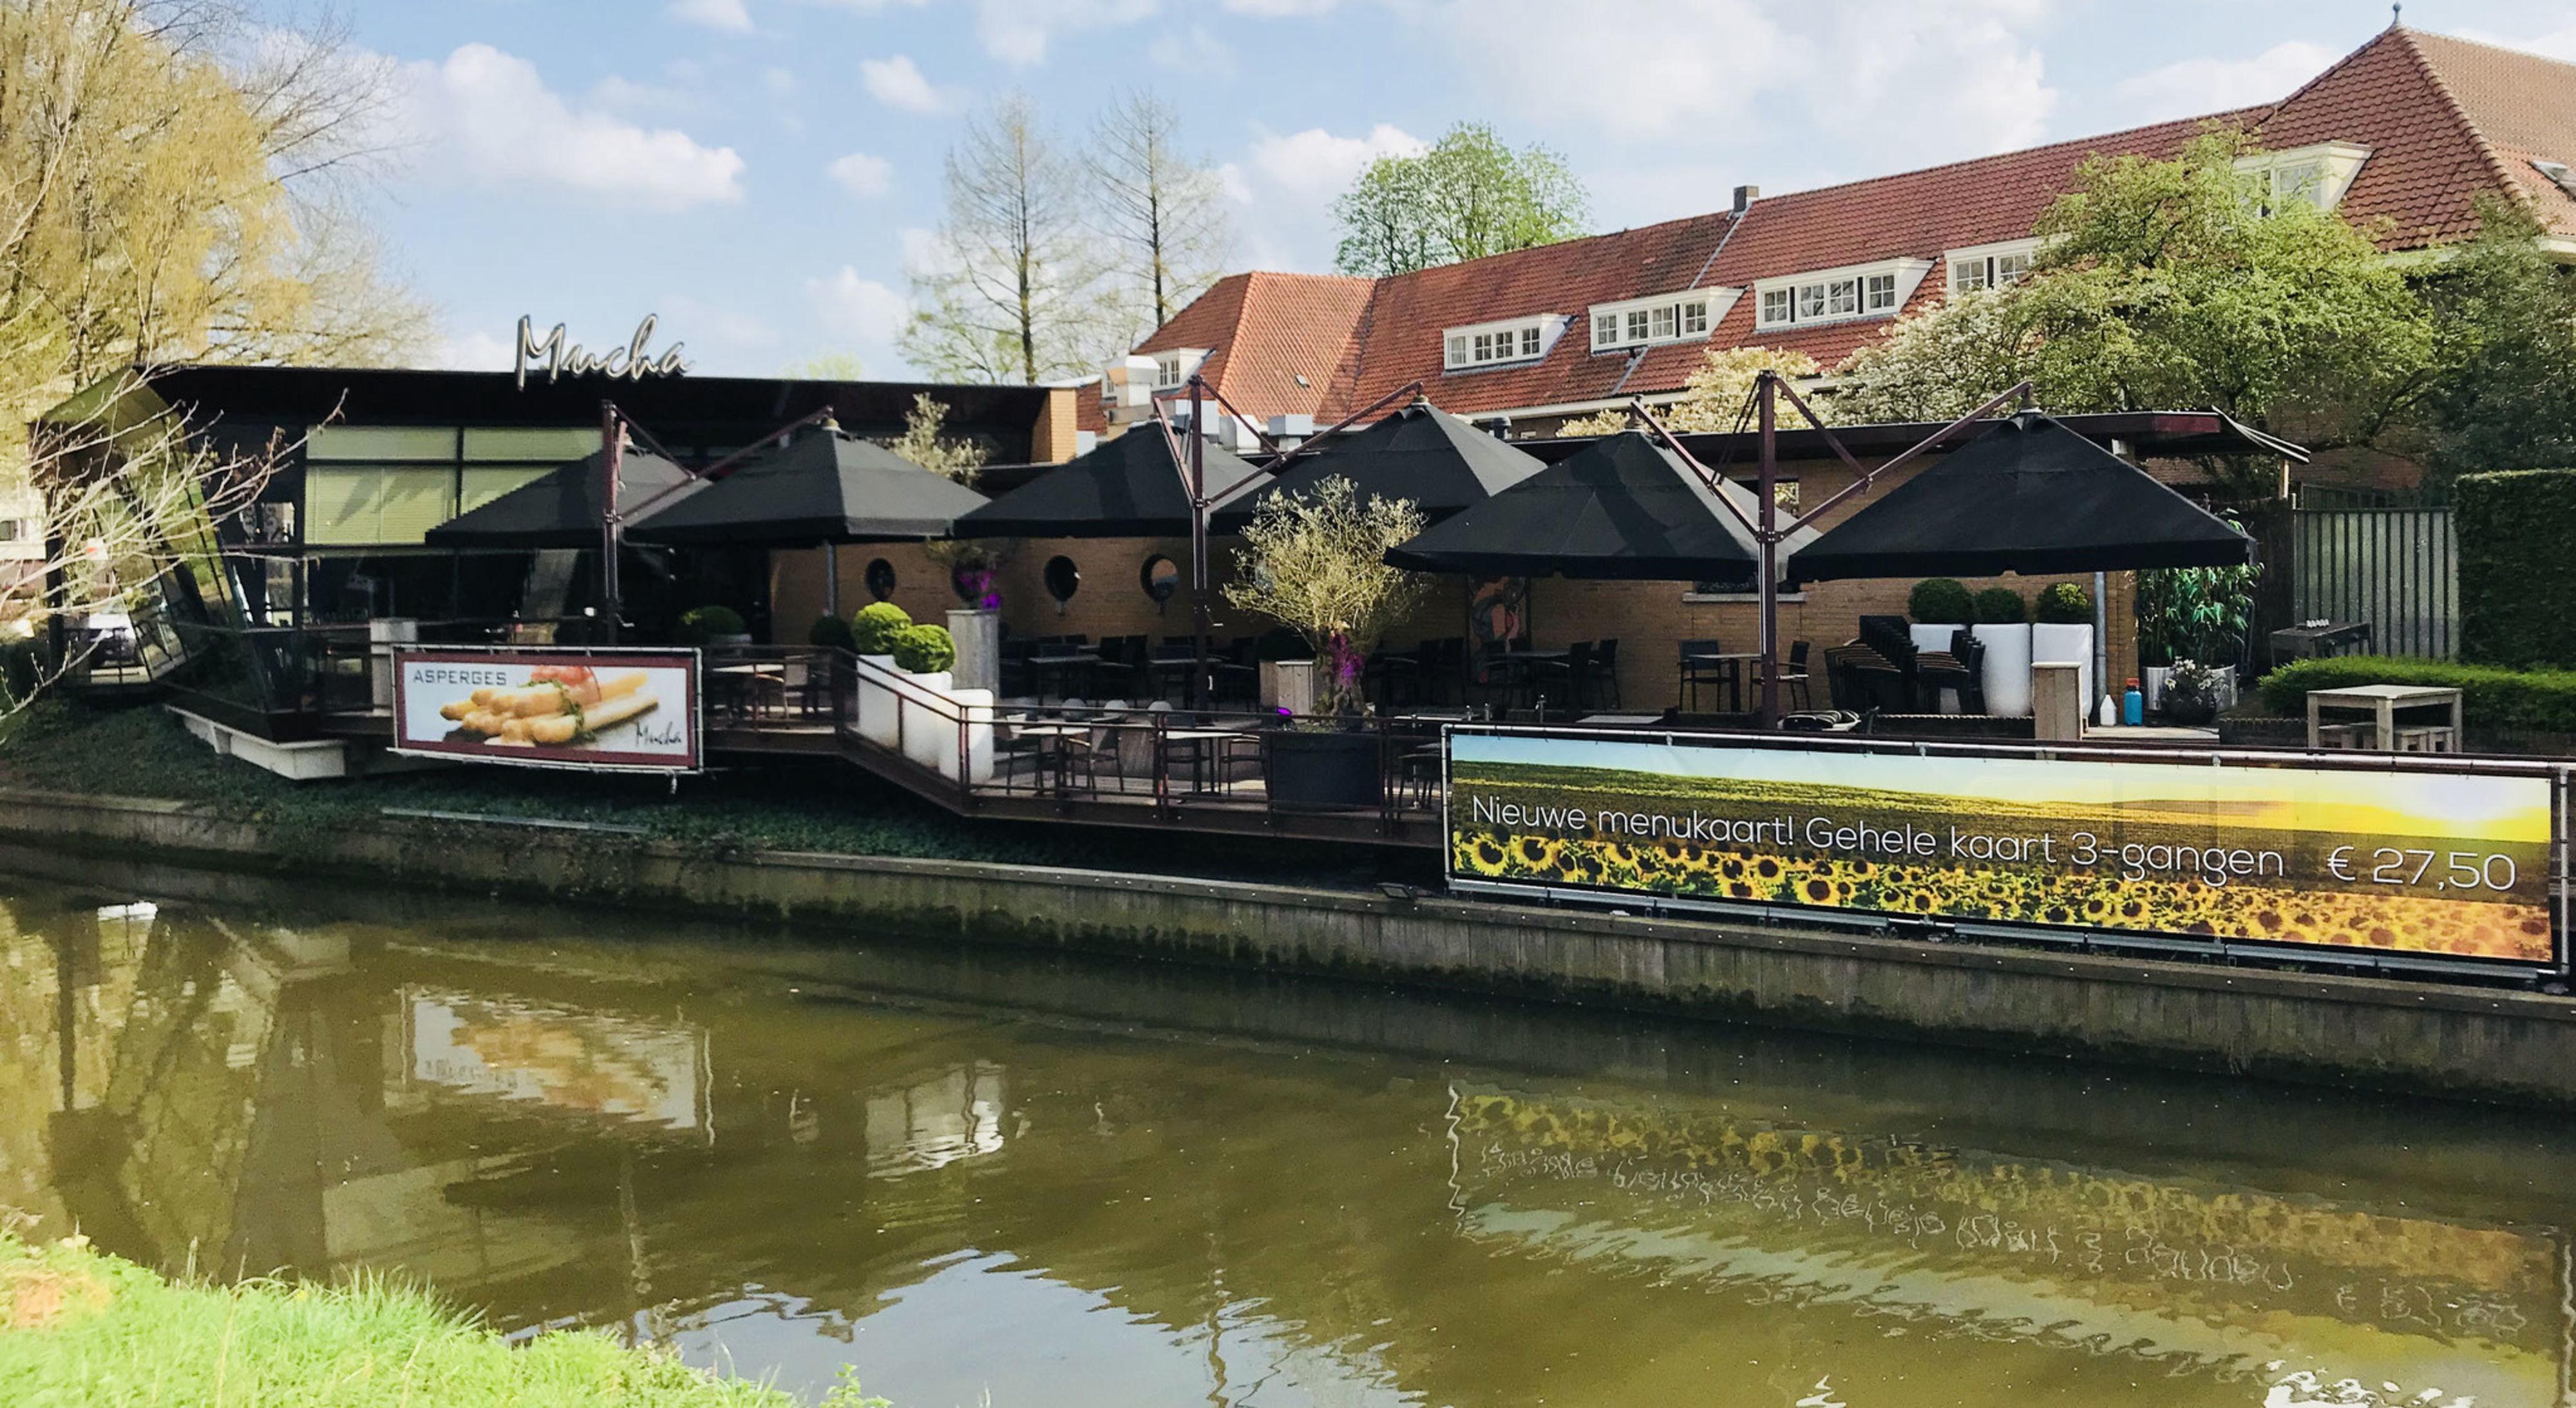 Trouwen in Veenendaal